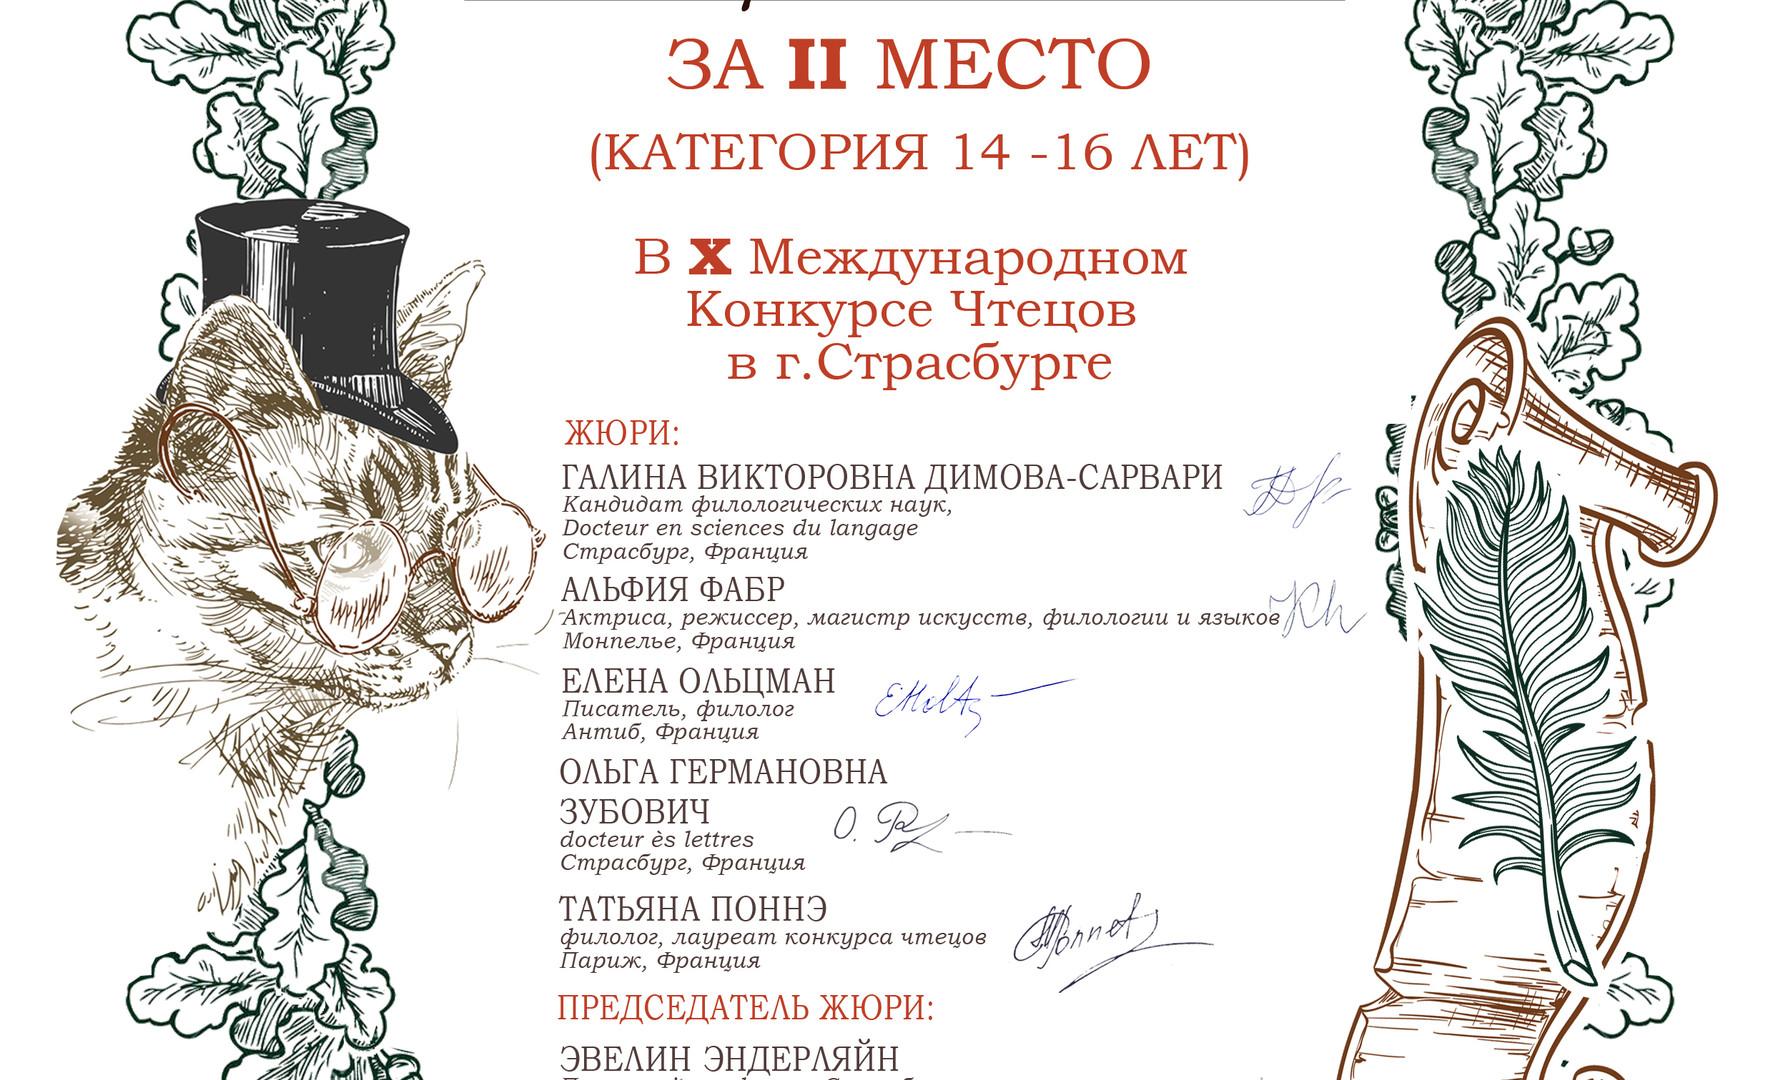 Diplom_KCH_X_2_place_14-16.jpg